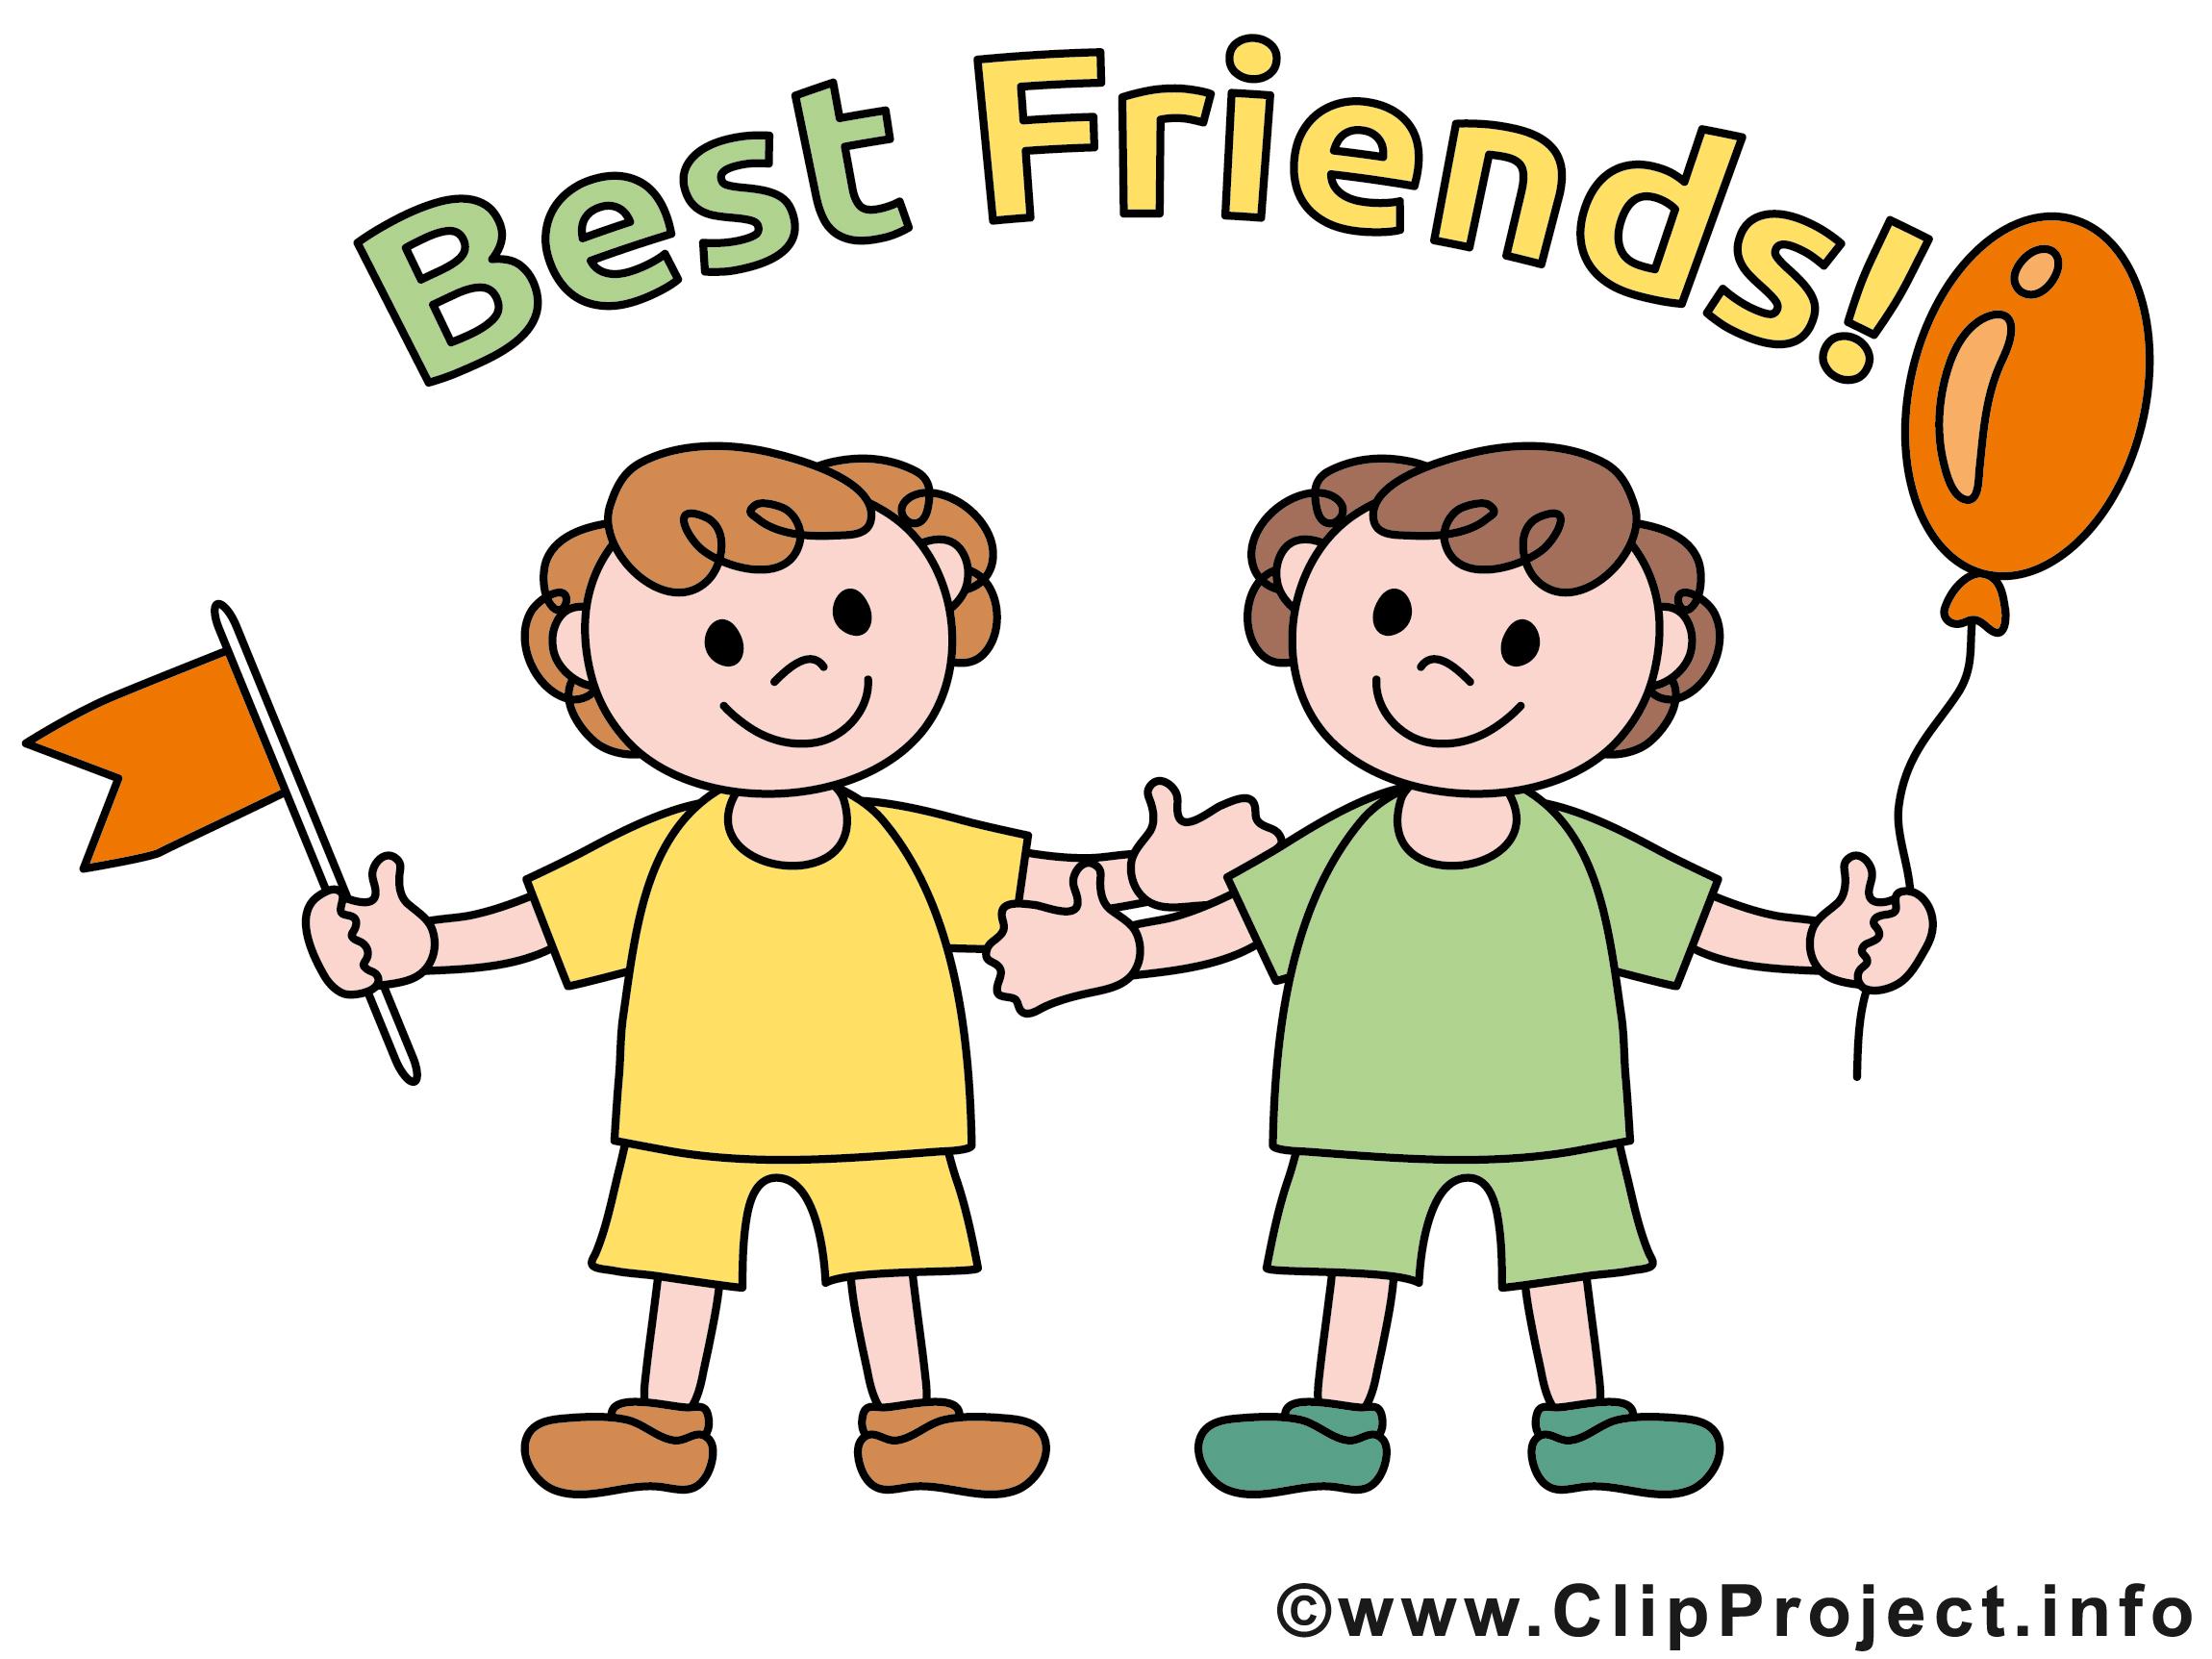 Gute freunde clipart clipart freeuse stock Beste Freunde Bilder, Cliparts, Cartoons, Grafiken, Illustrationen ... clipart freeuse stock